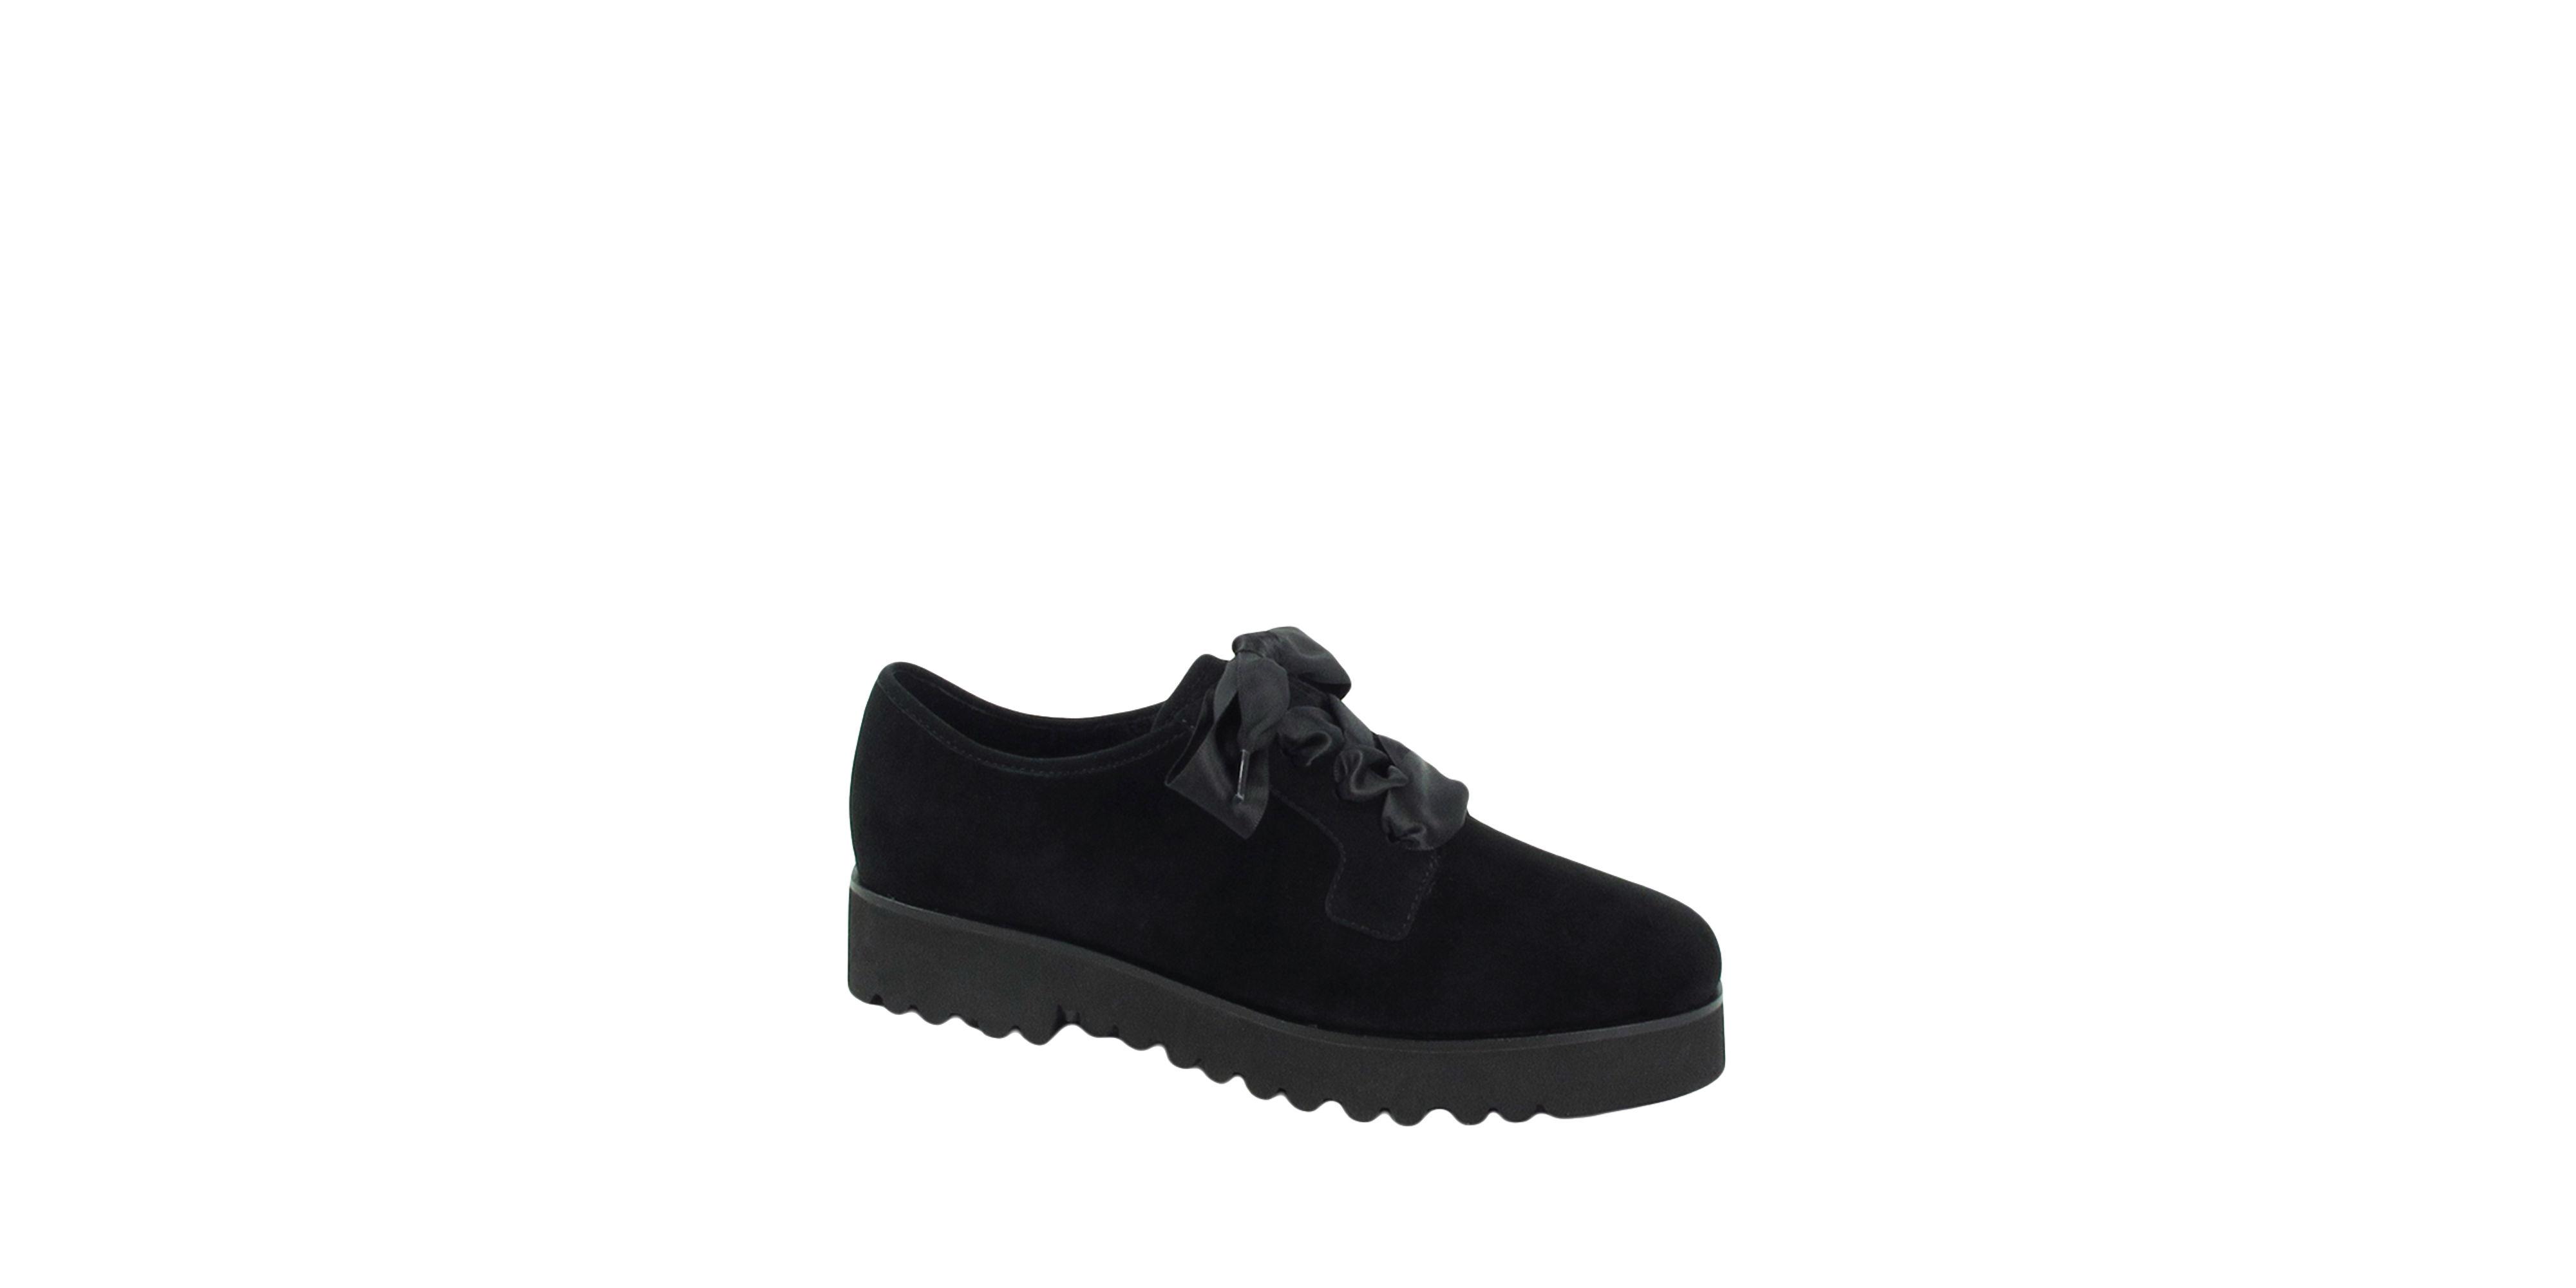 Ron White Sofi Cozy Oxford Shoes In Black Lyst